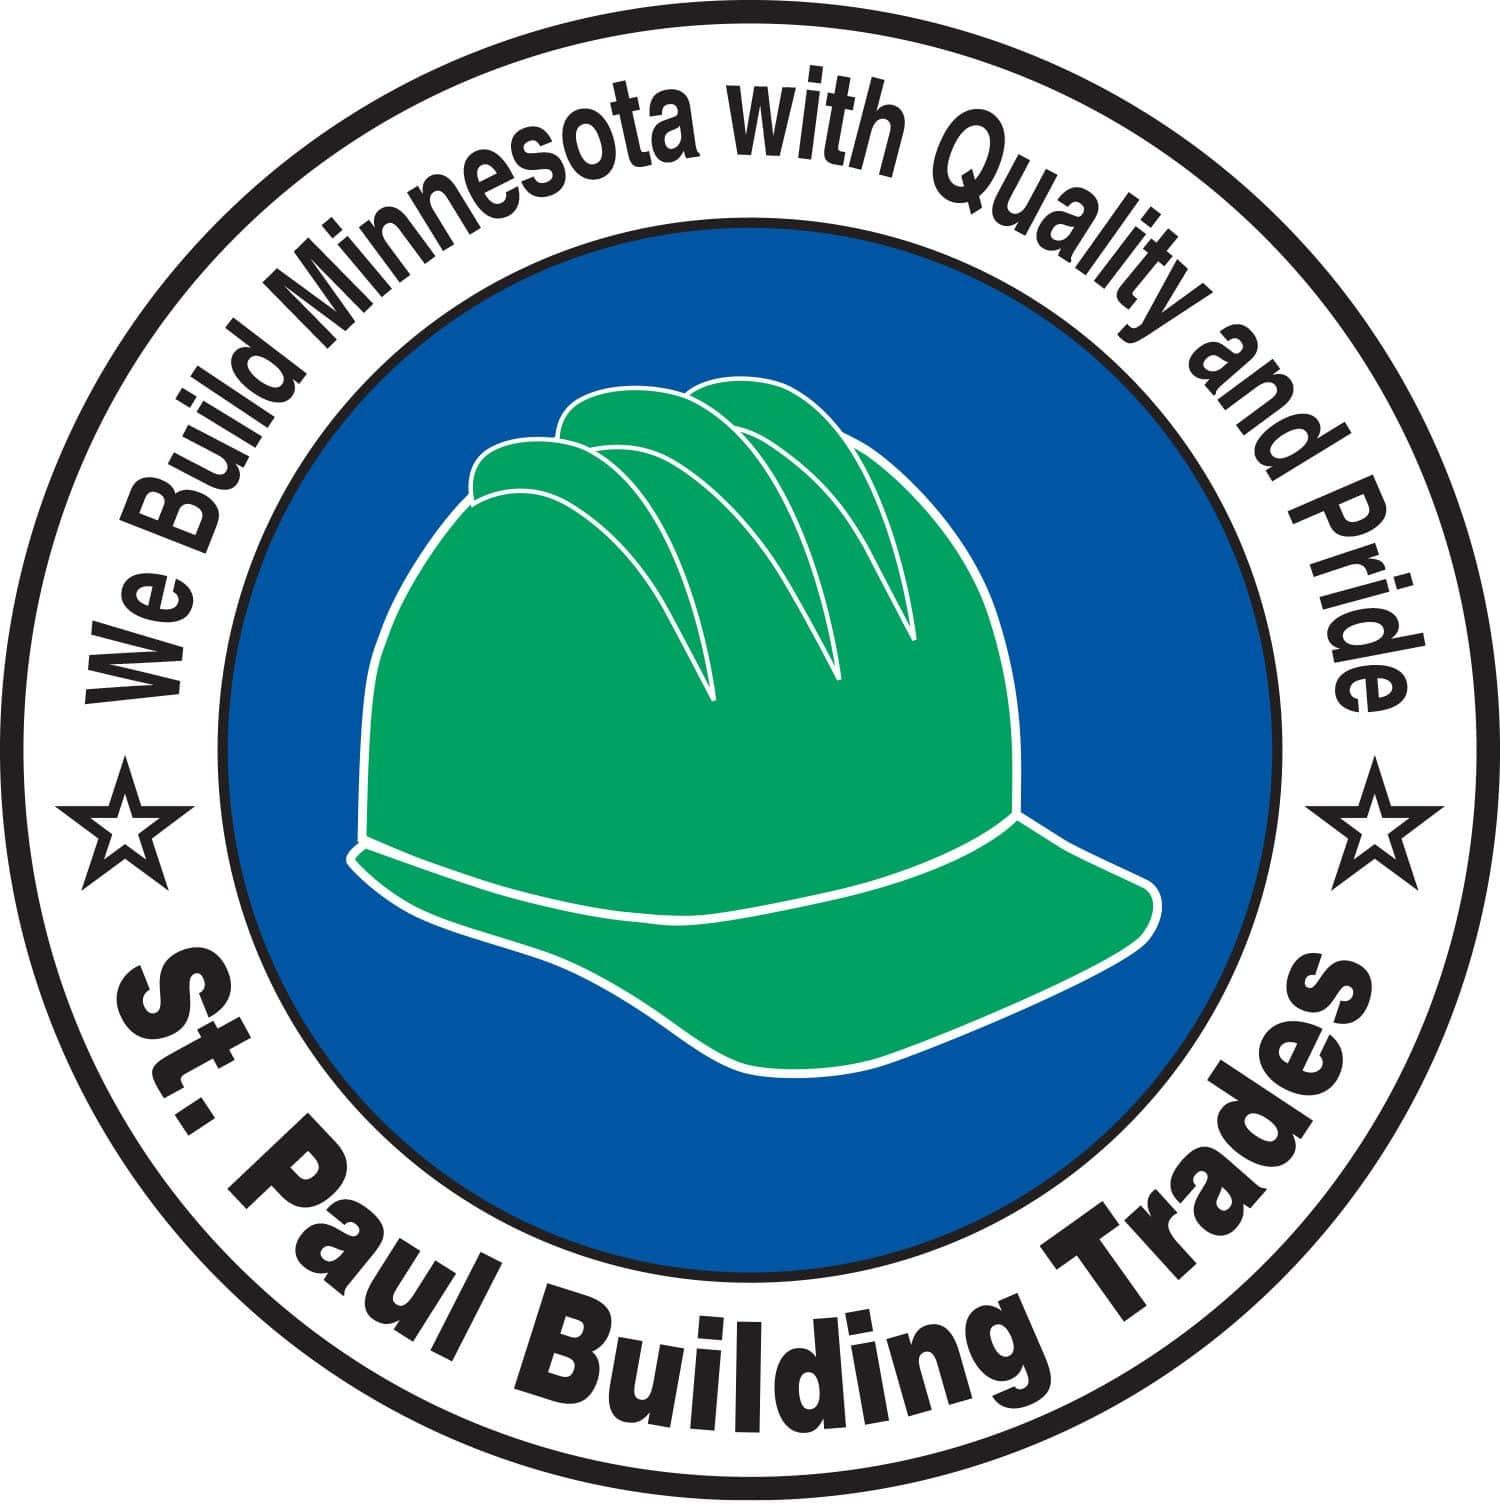 StPaul Building Trades